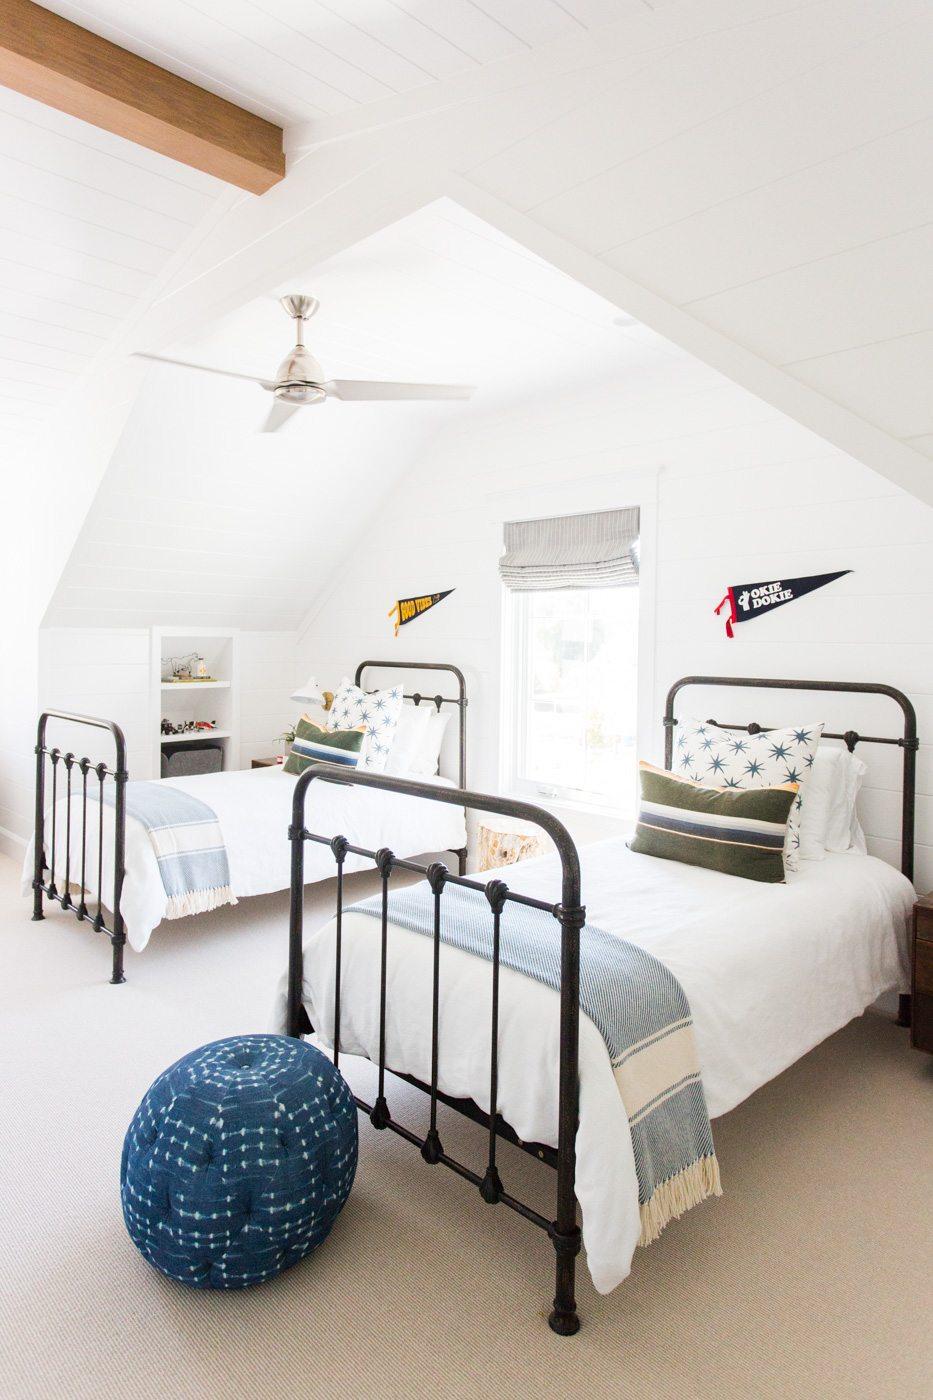 Modern Home Decor Ideas - Teen Boy Bedrooms| cc&mike ... on Guys Bedroom Ideas  id=28075